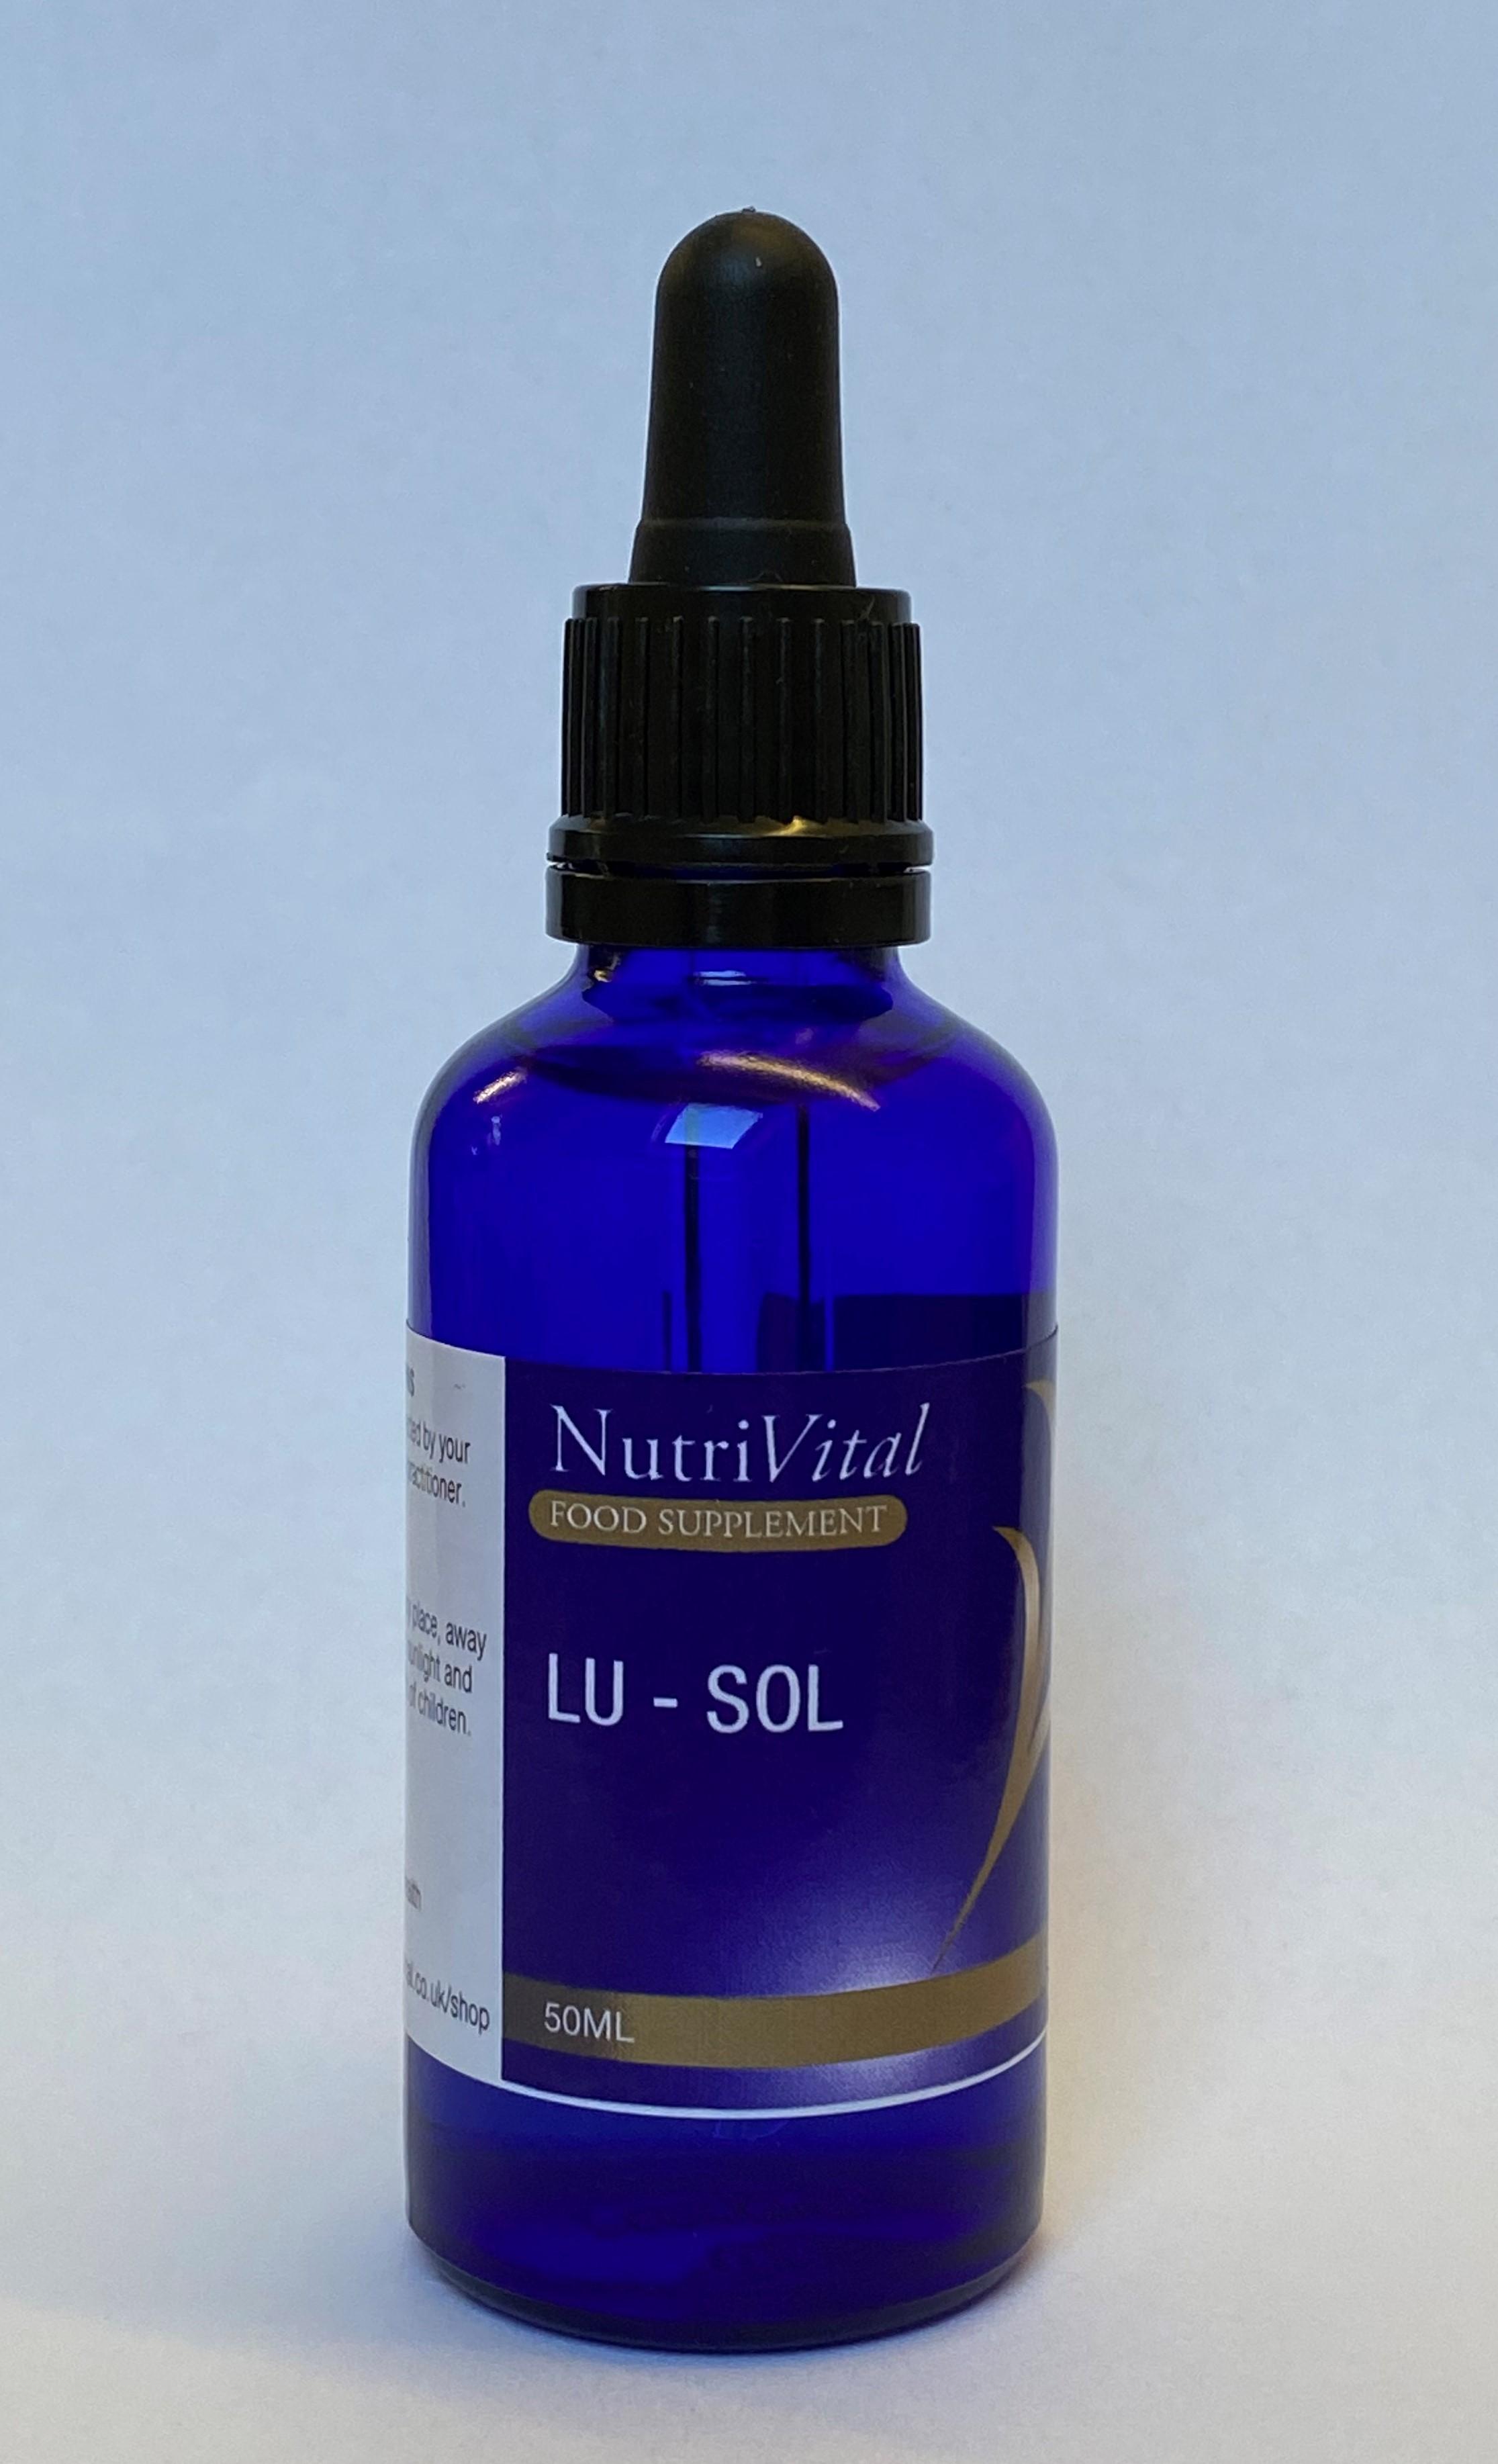 LU-SOL 50ml